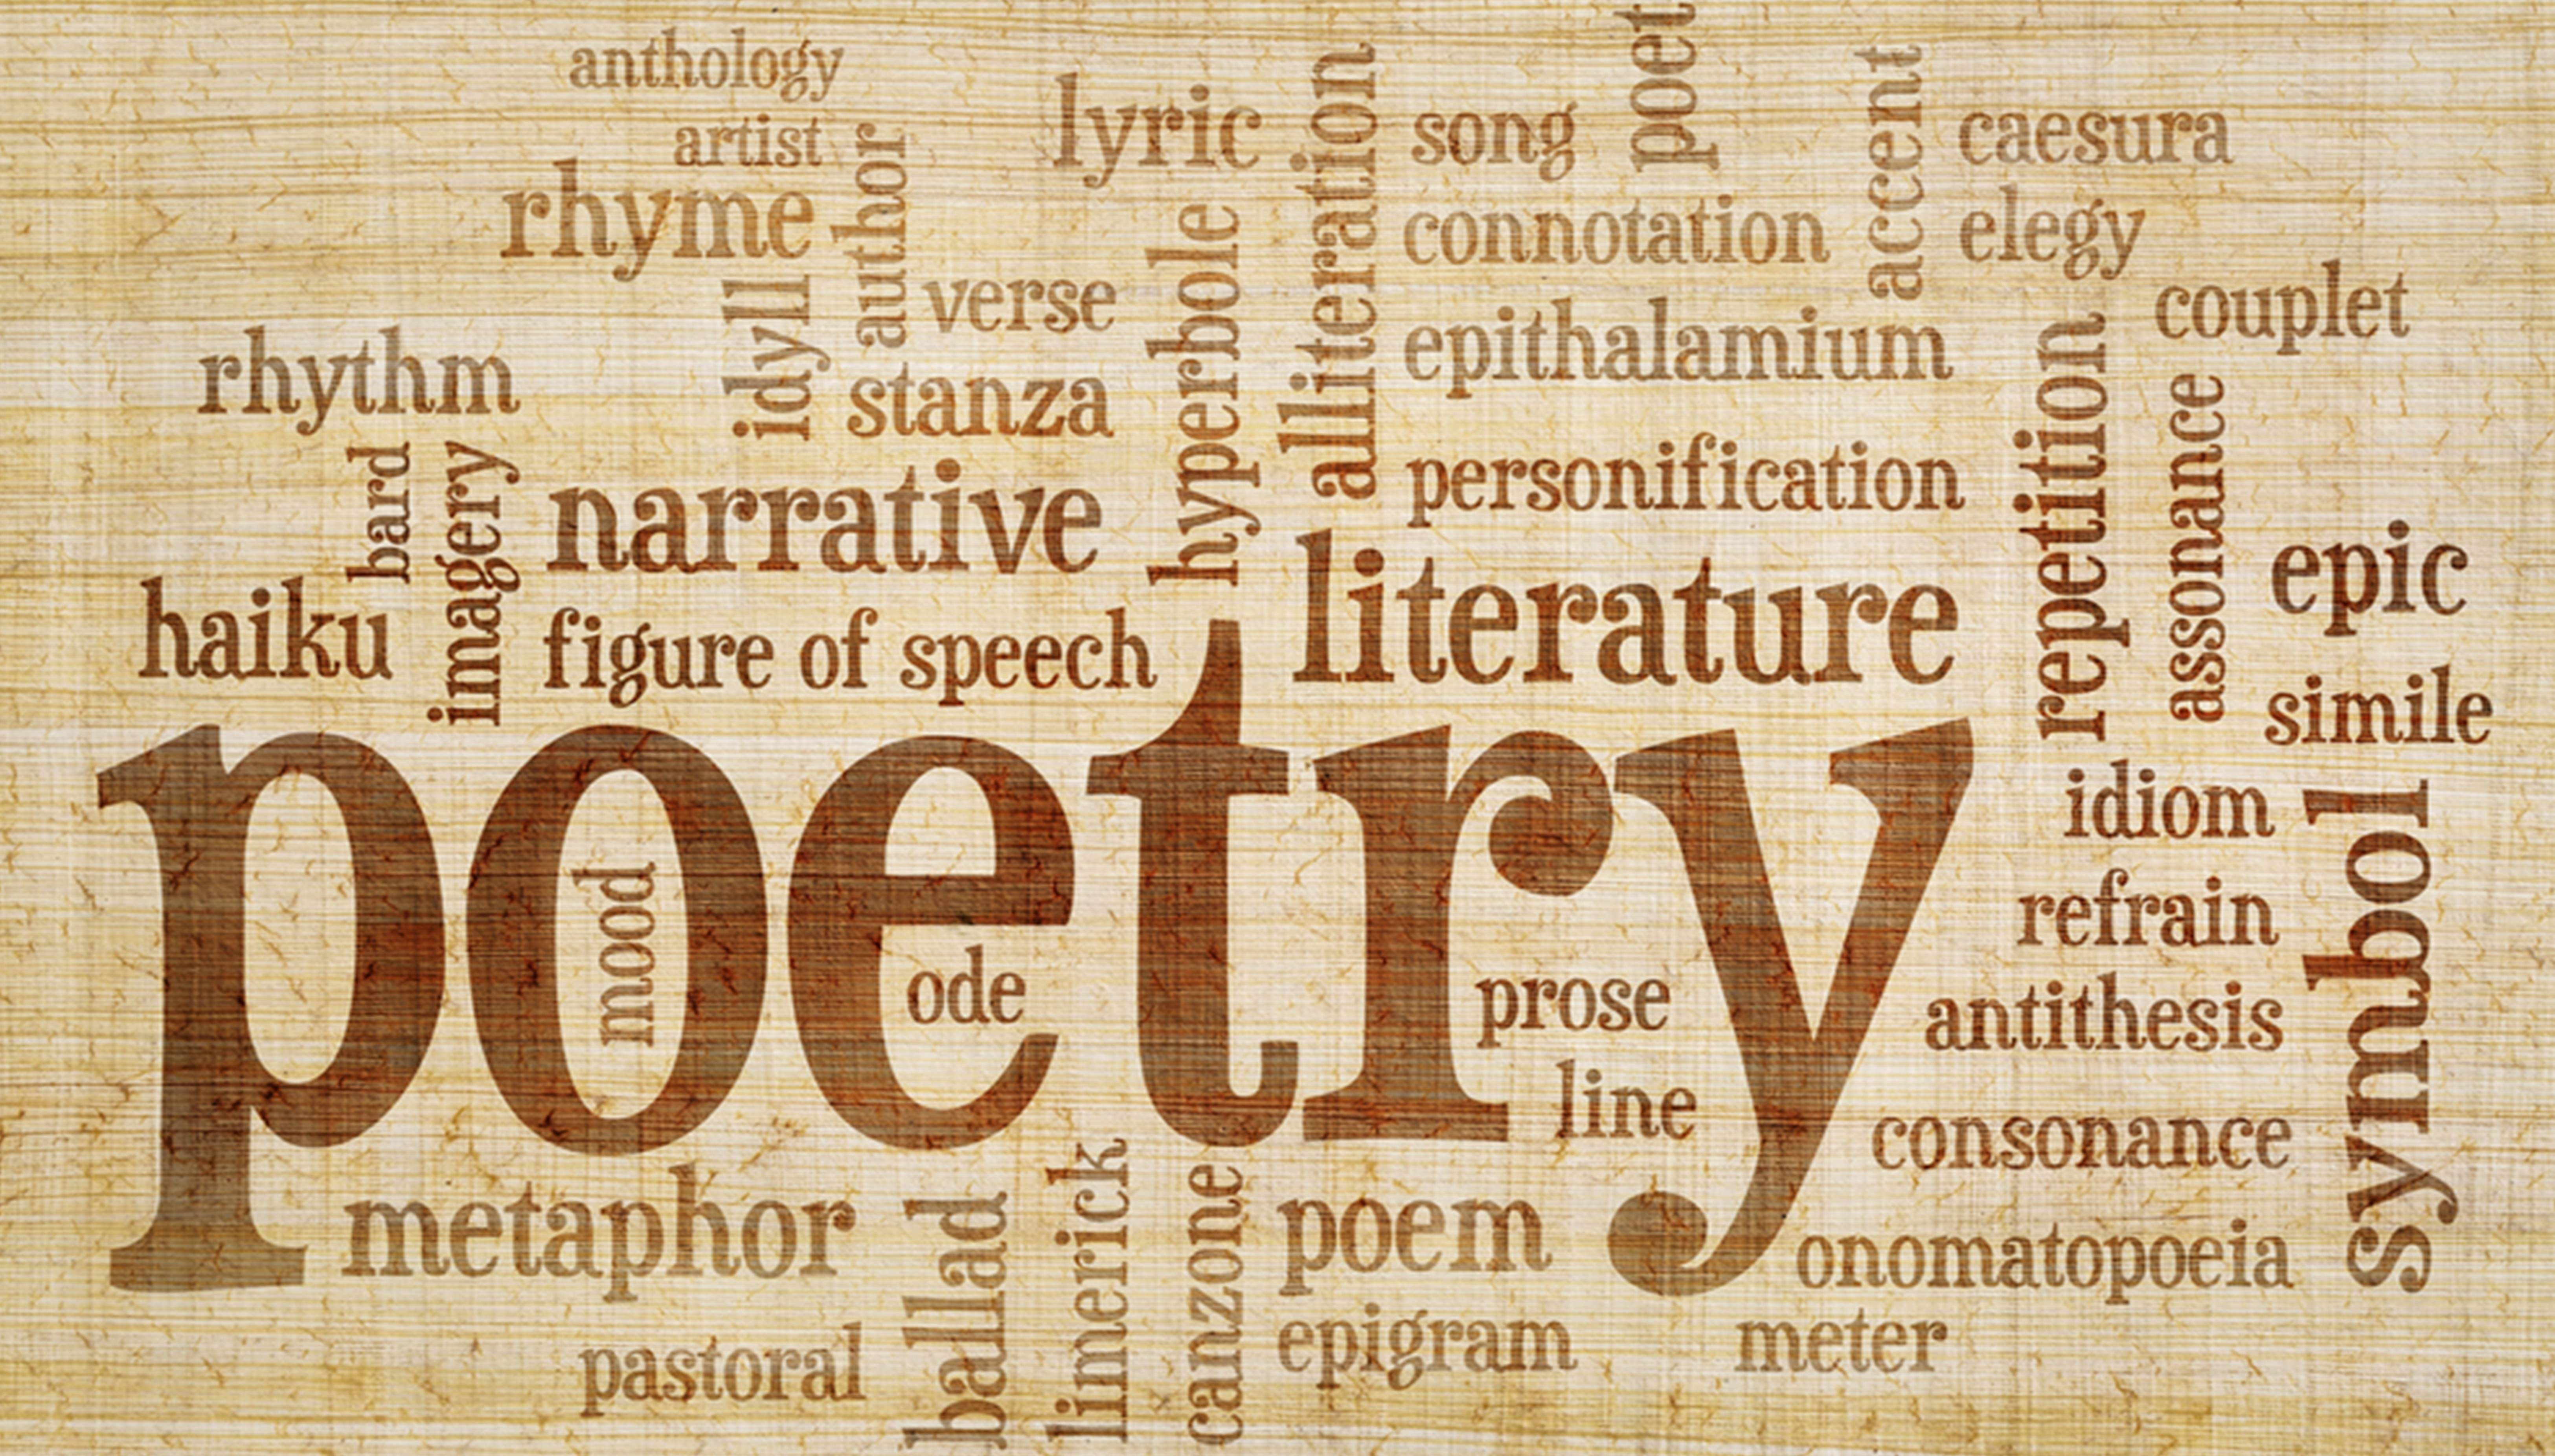 Austim-Macauley-Poetry-Books